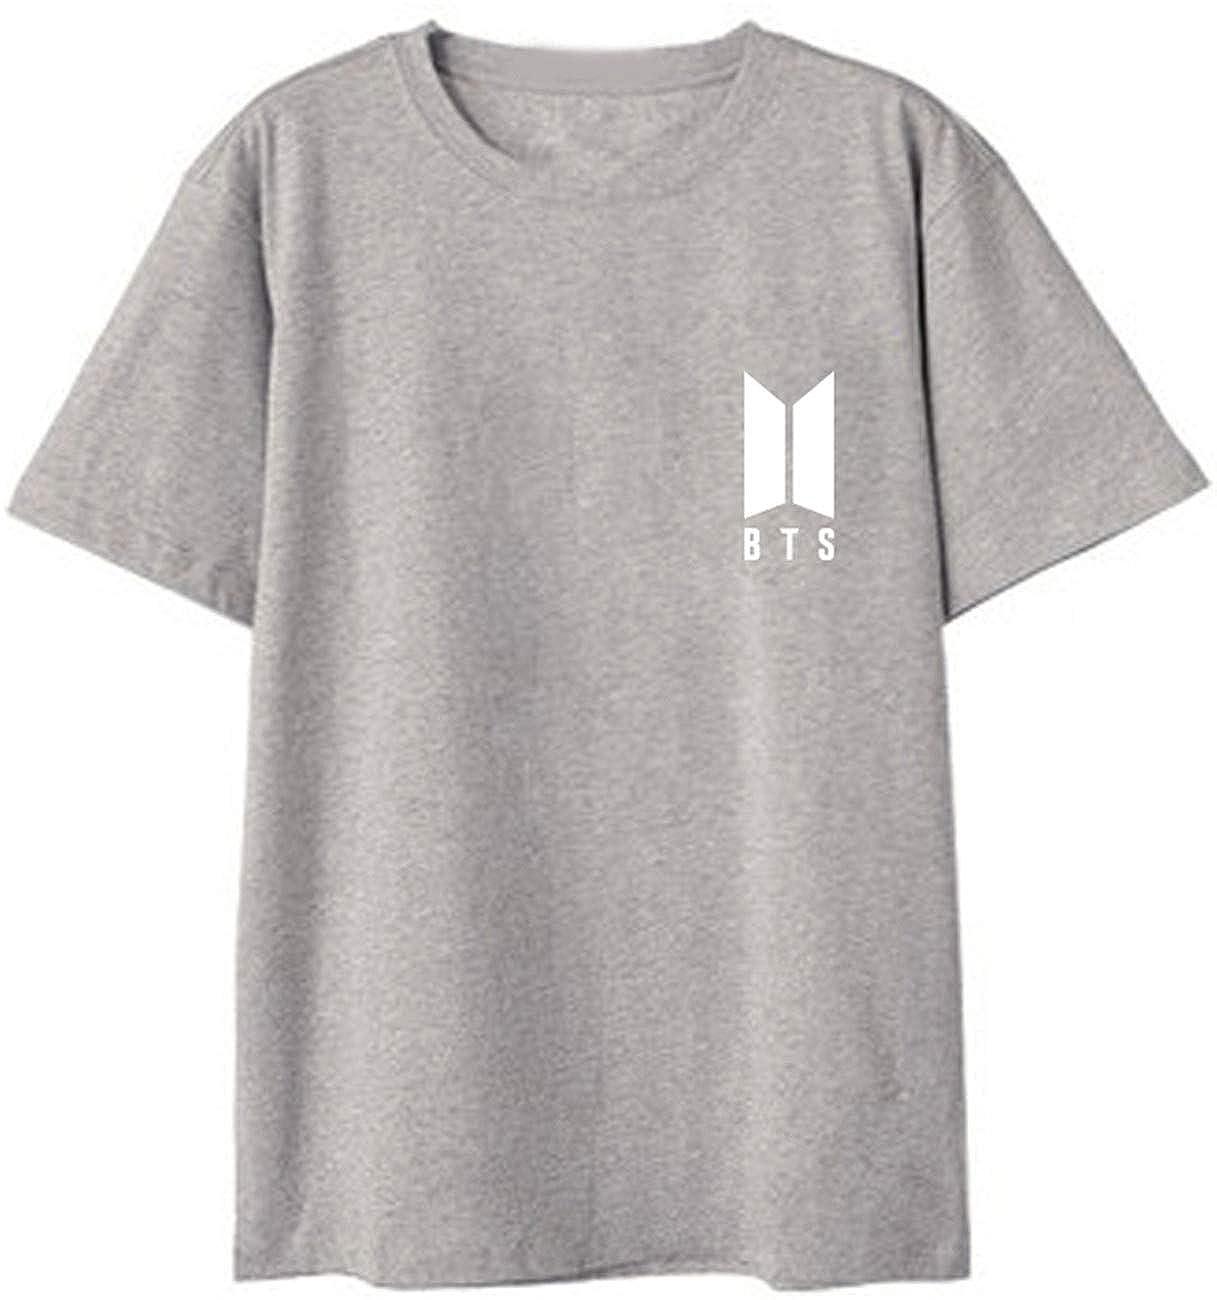 SERAPHY Unisex KPOP BTS T-shirt Bangtan Boys Top Birthday tshirts